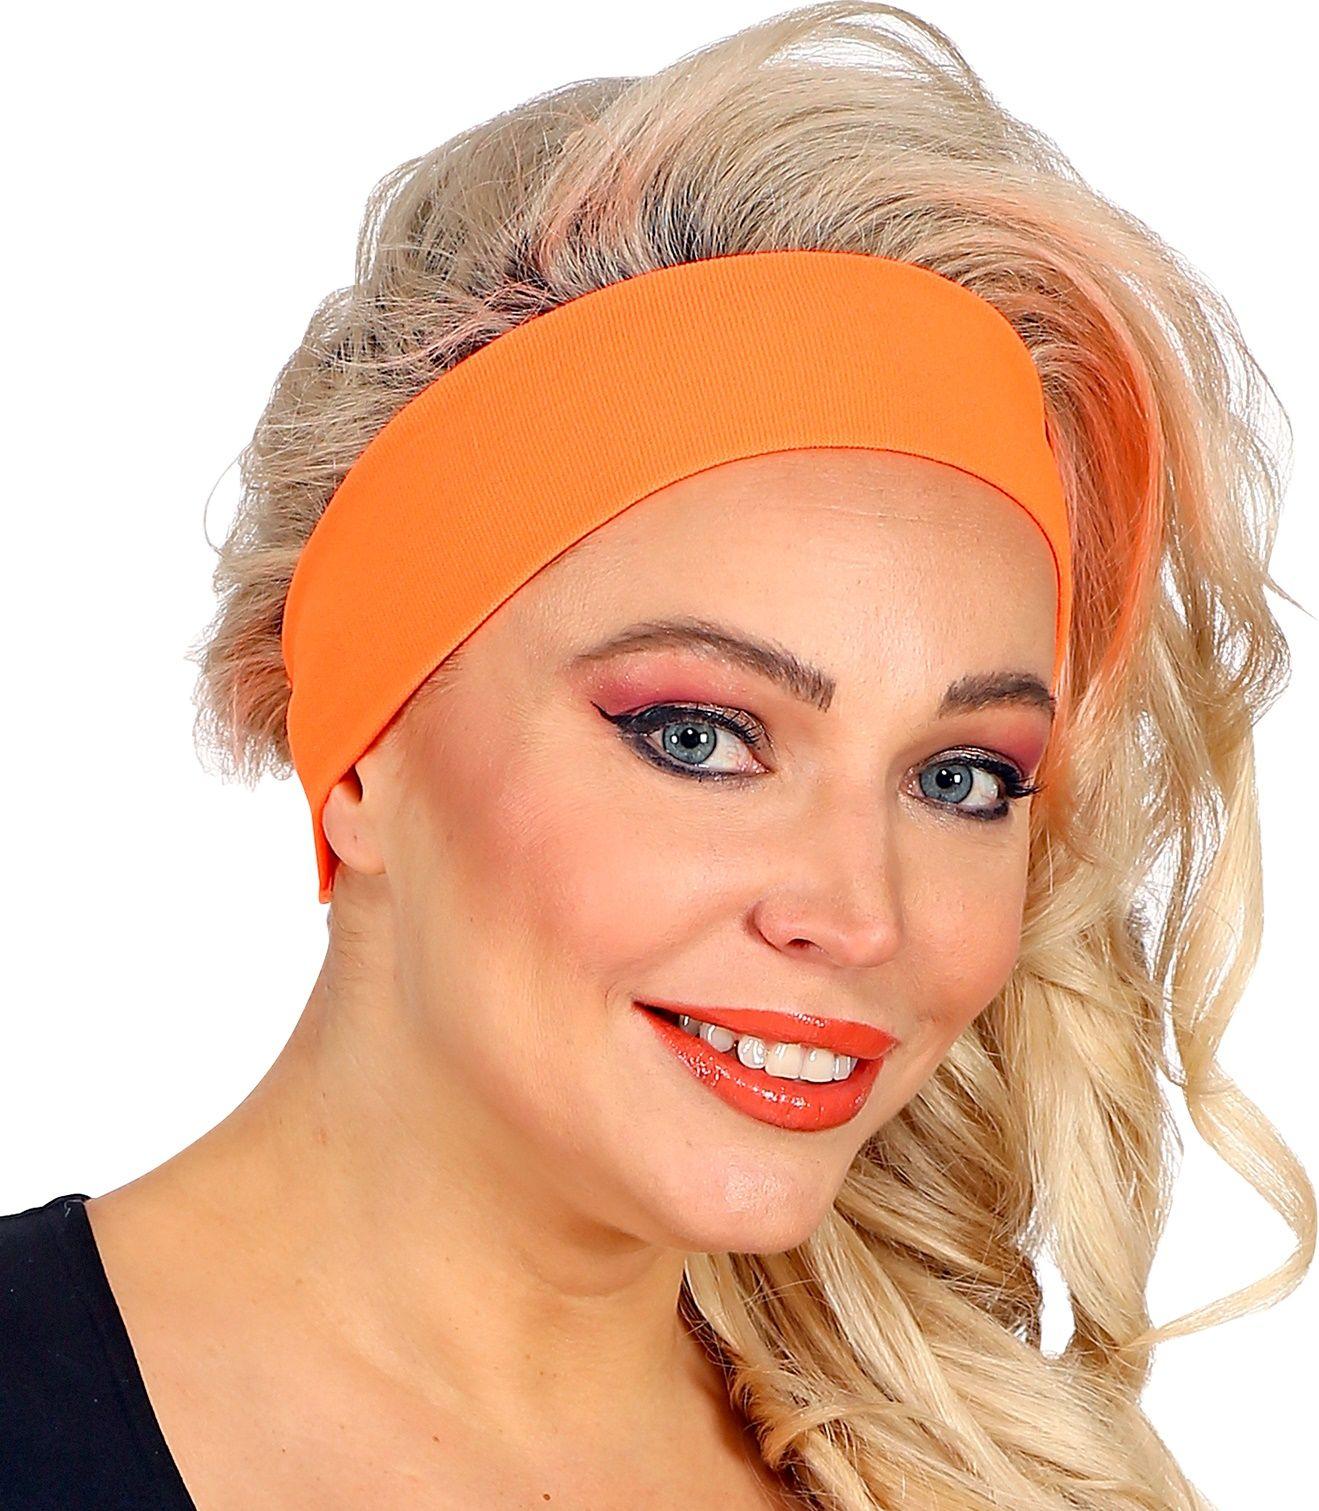 Neon oranje retro hoofdband